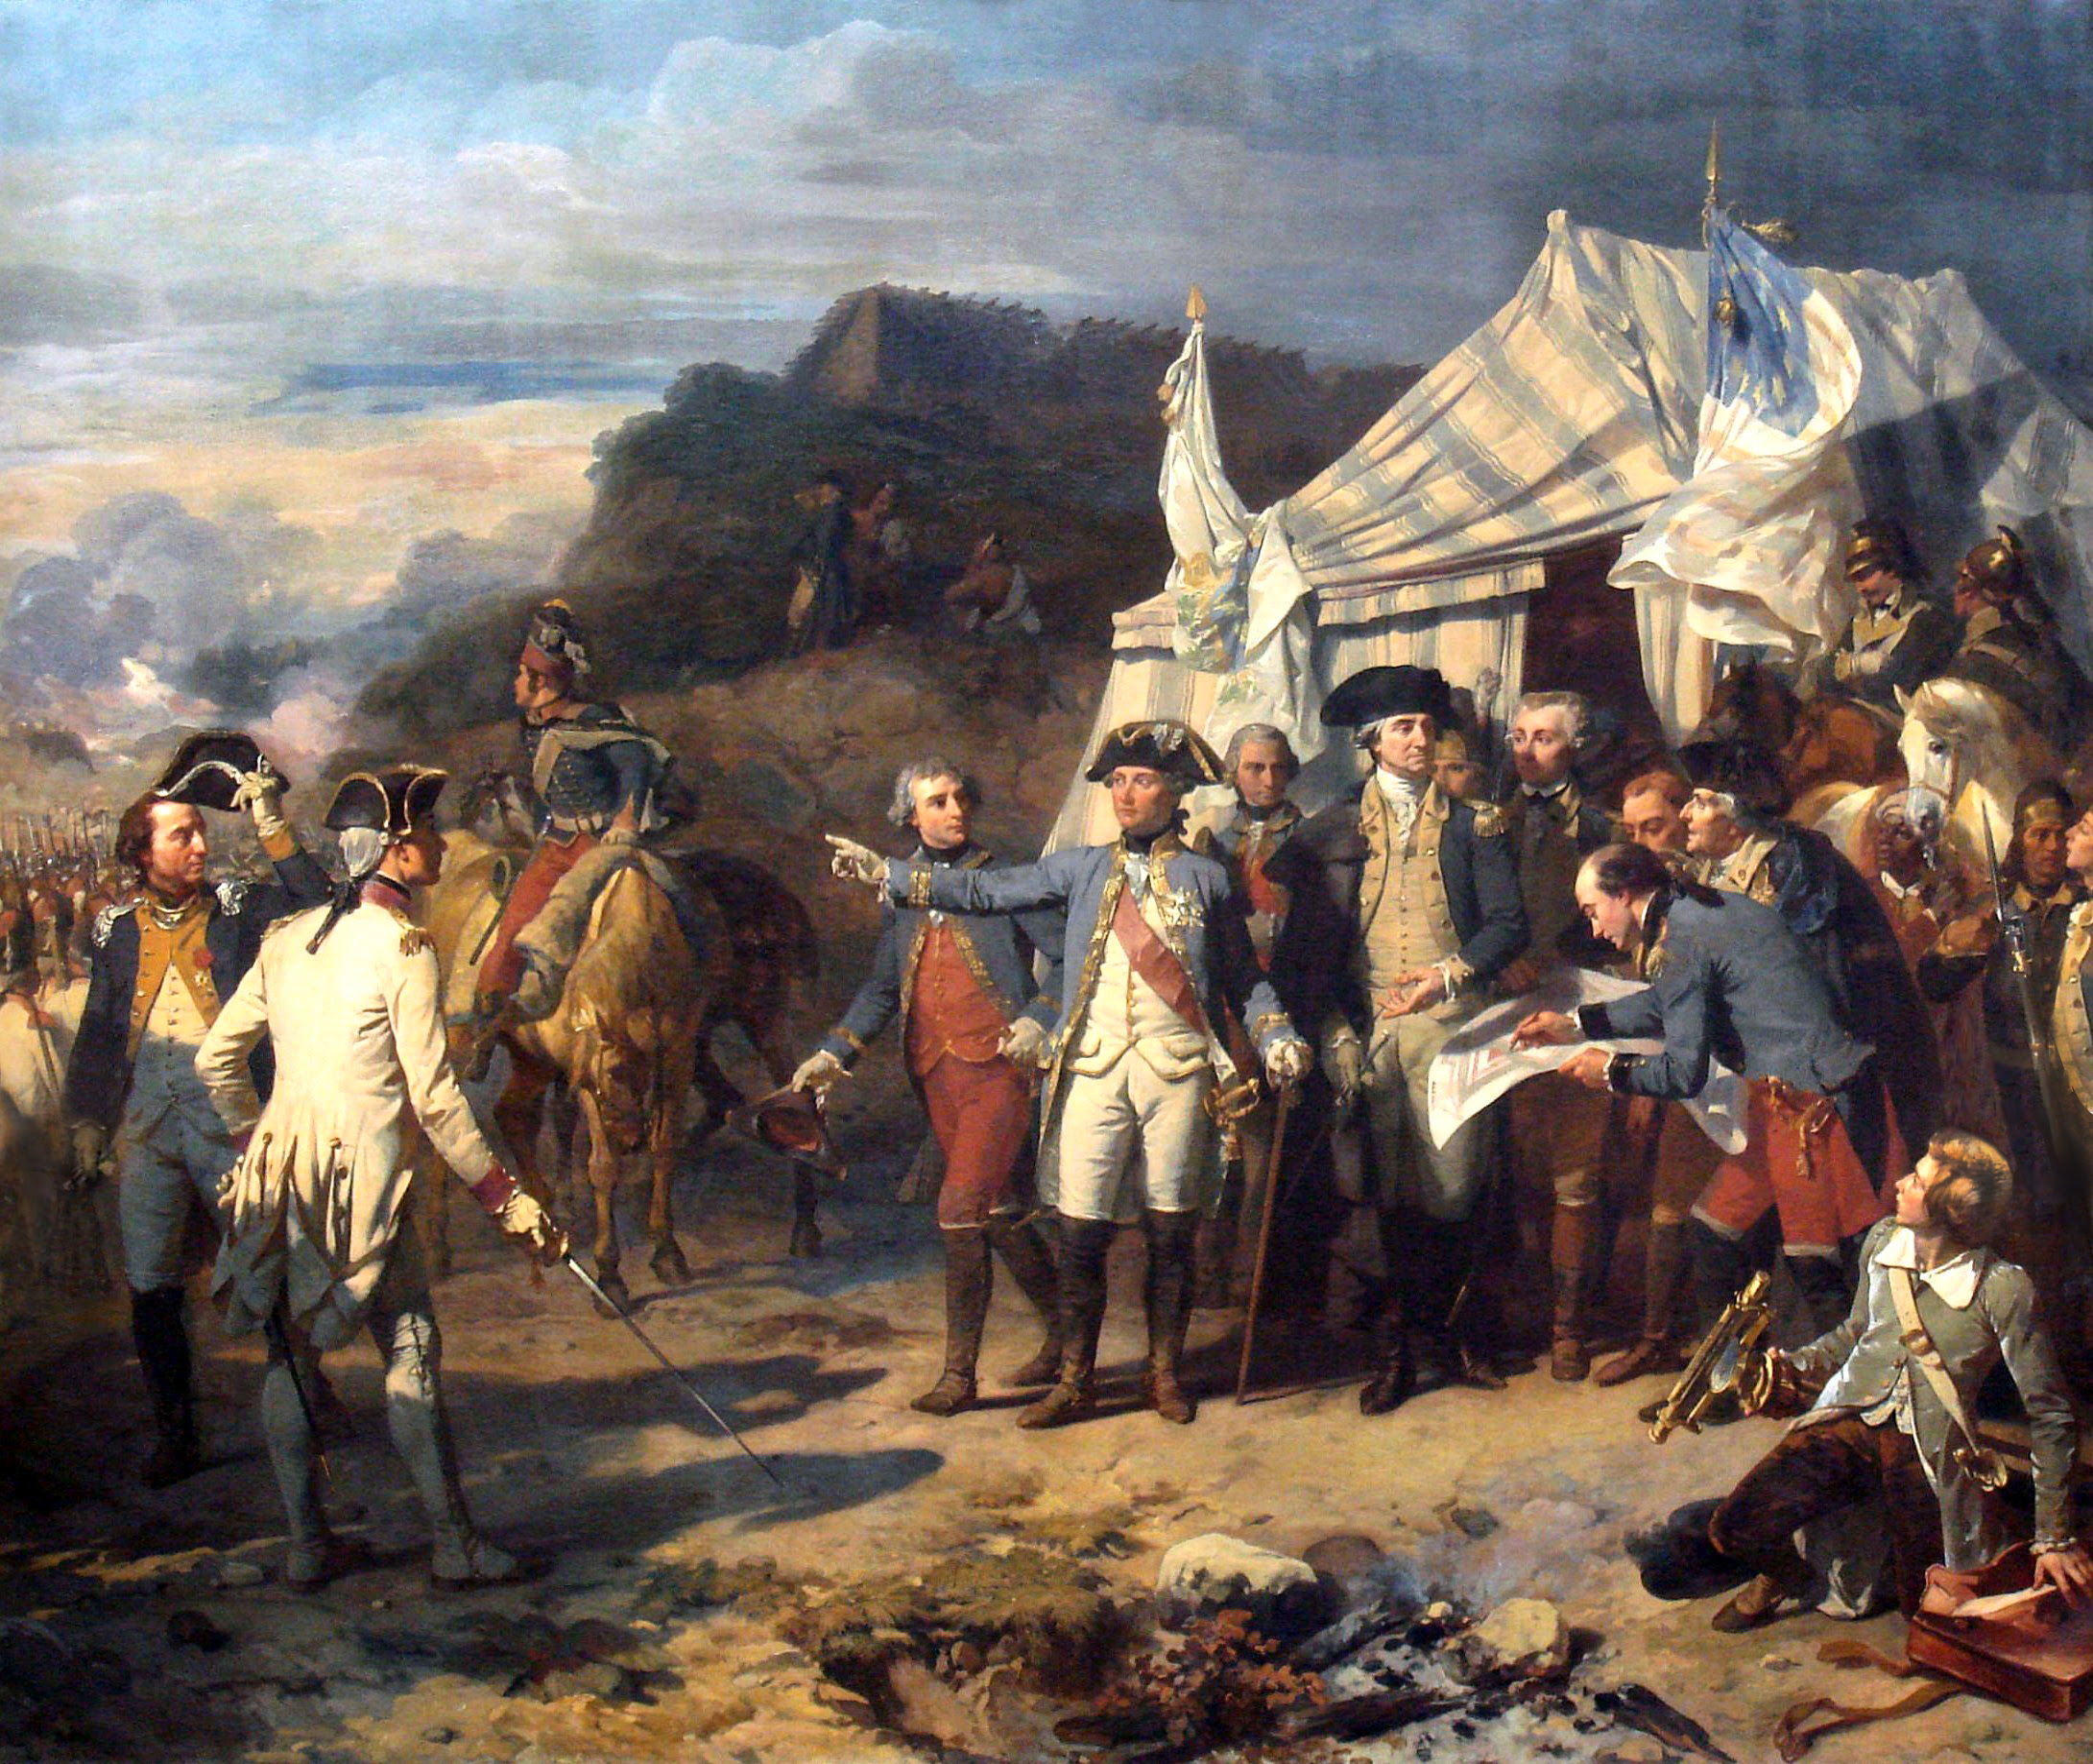 Siège de Yorktown by Auguste Couder